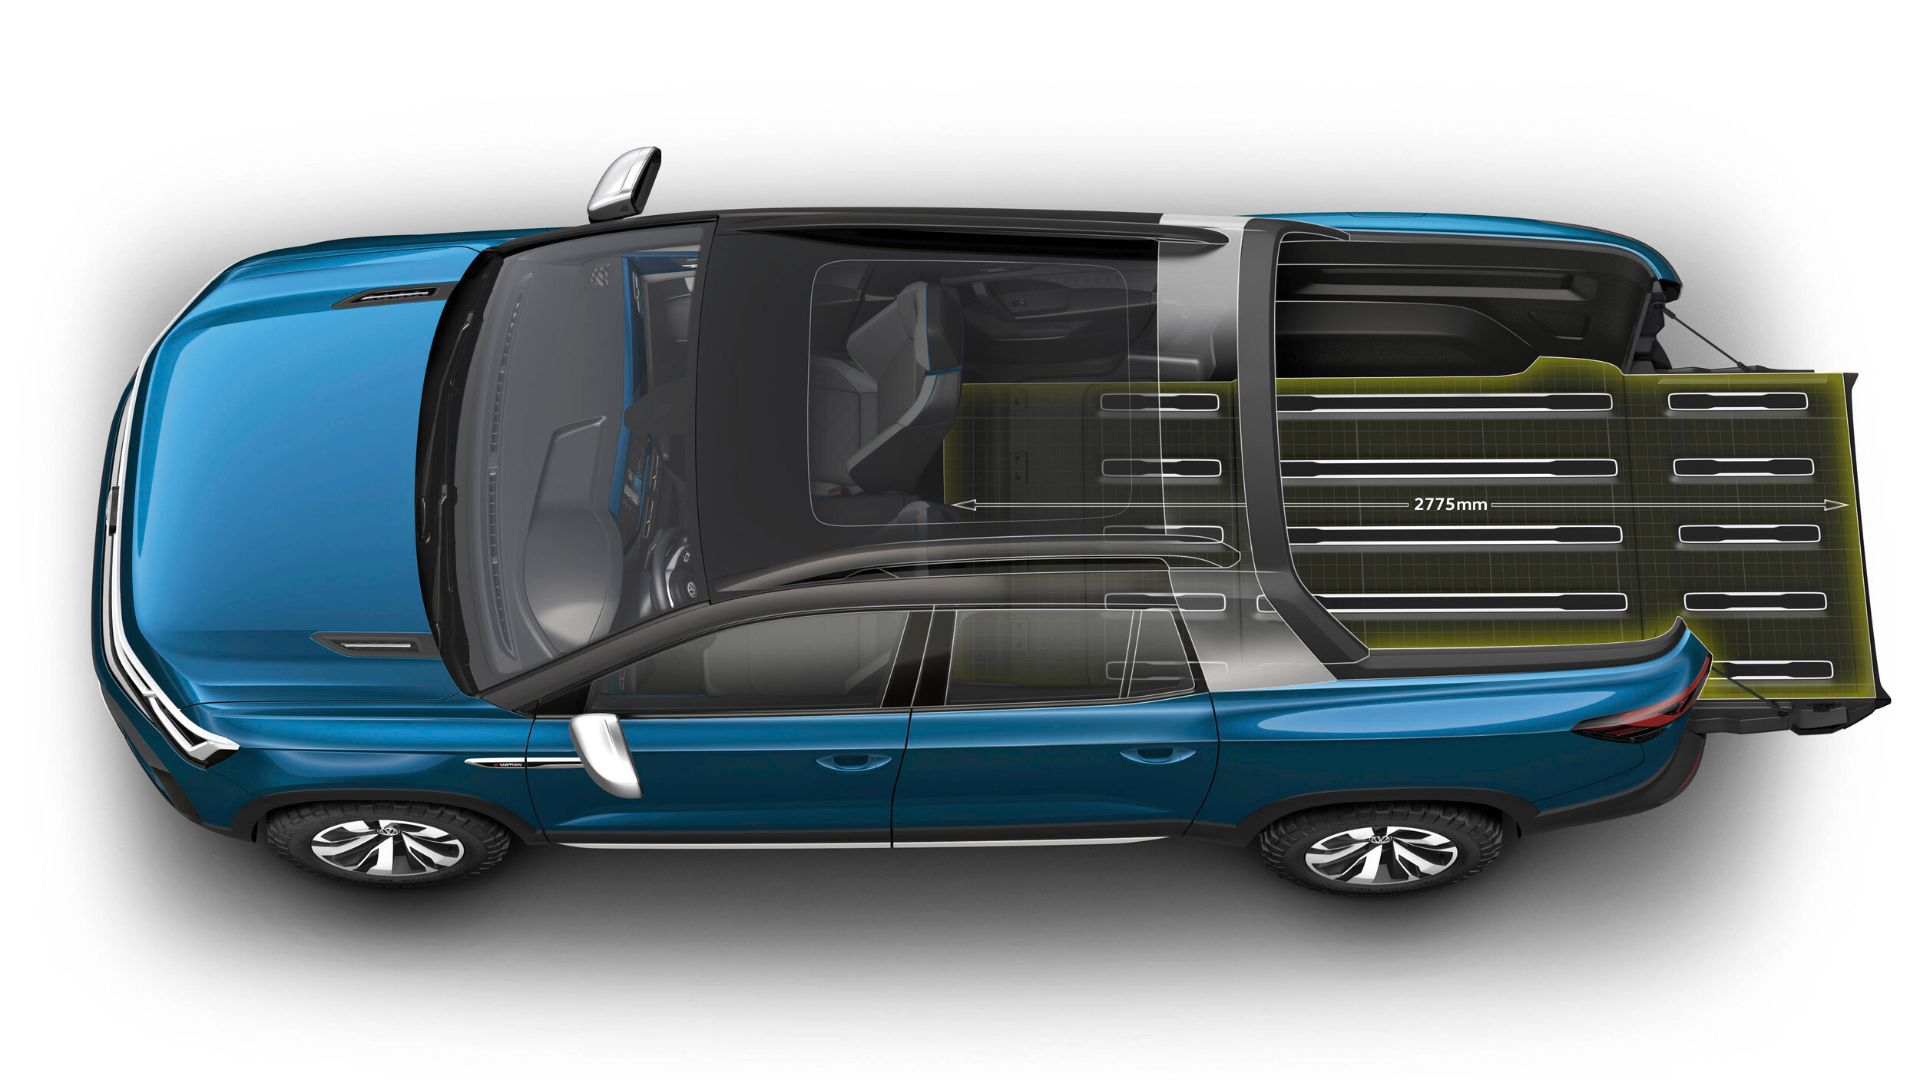 volkswagen tarok concept vista de cima mostrando a area de carga com os bancos rebatidos